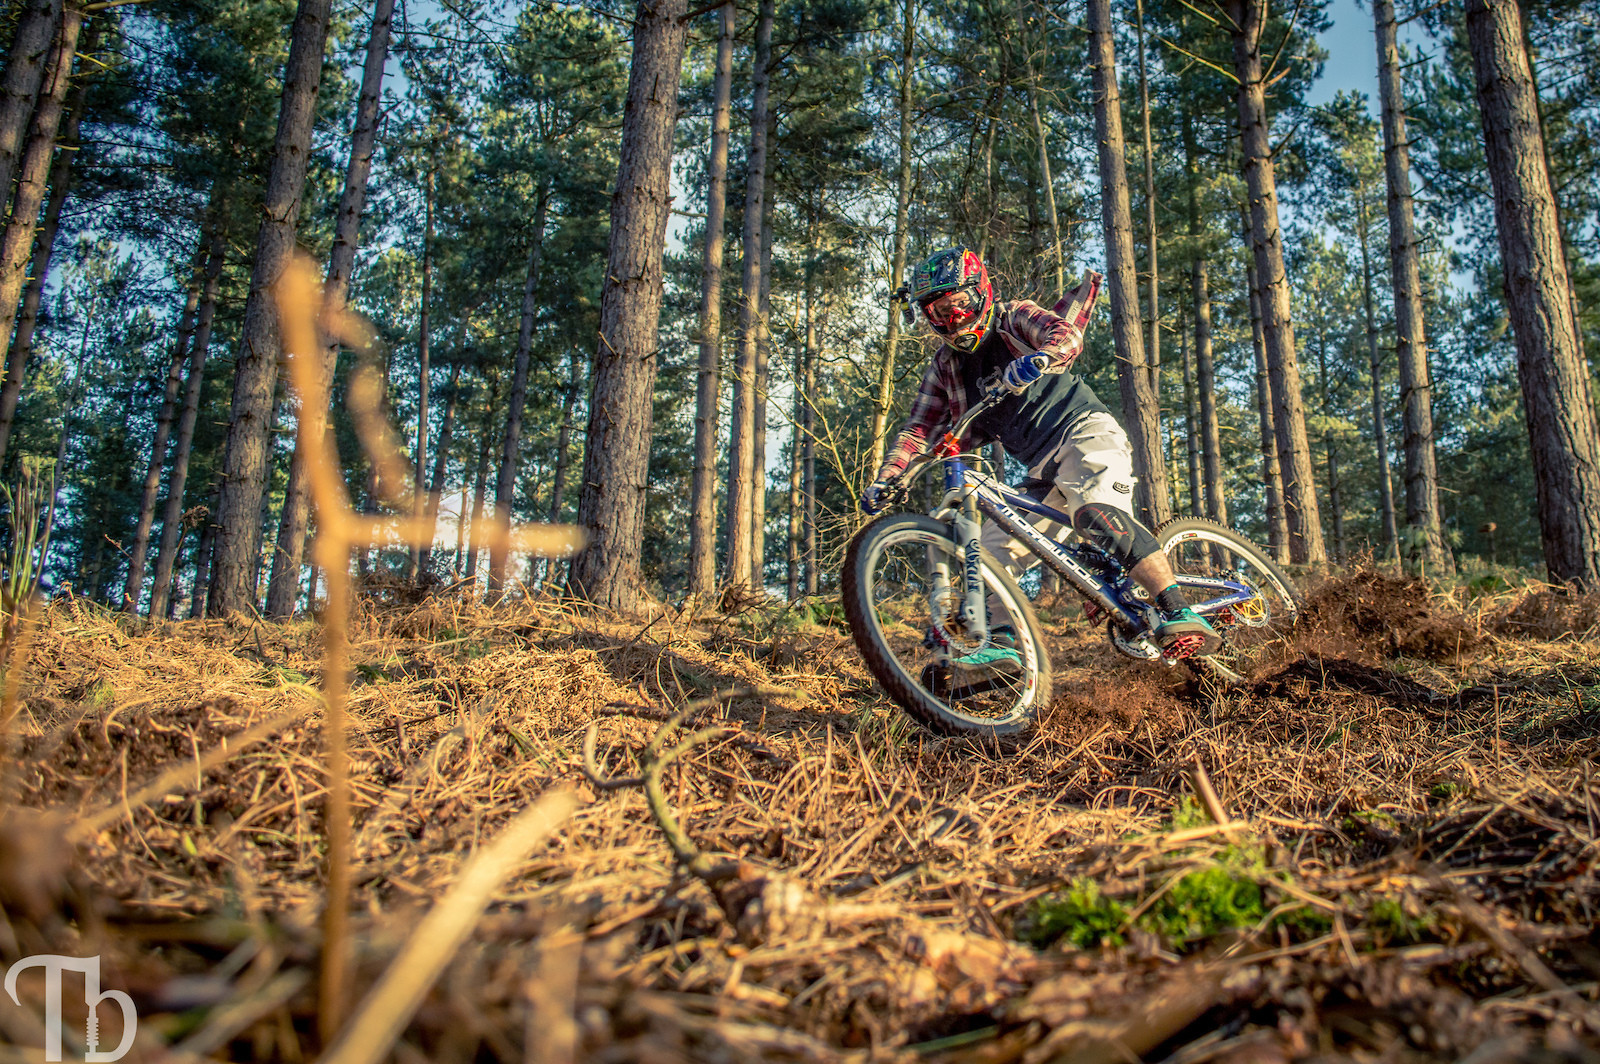 Kicking loam - KillerXL5 - Mountain Biking Pictures - Vital MTB